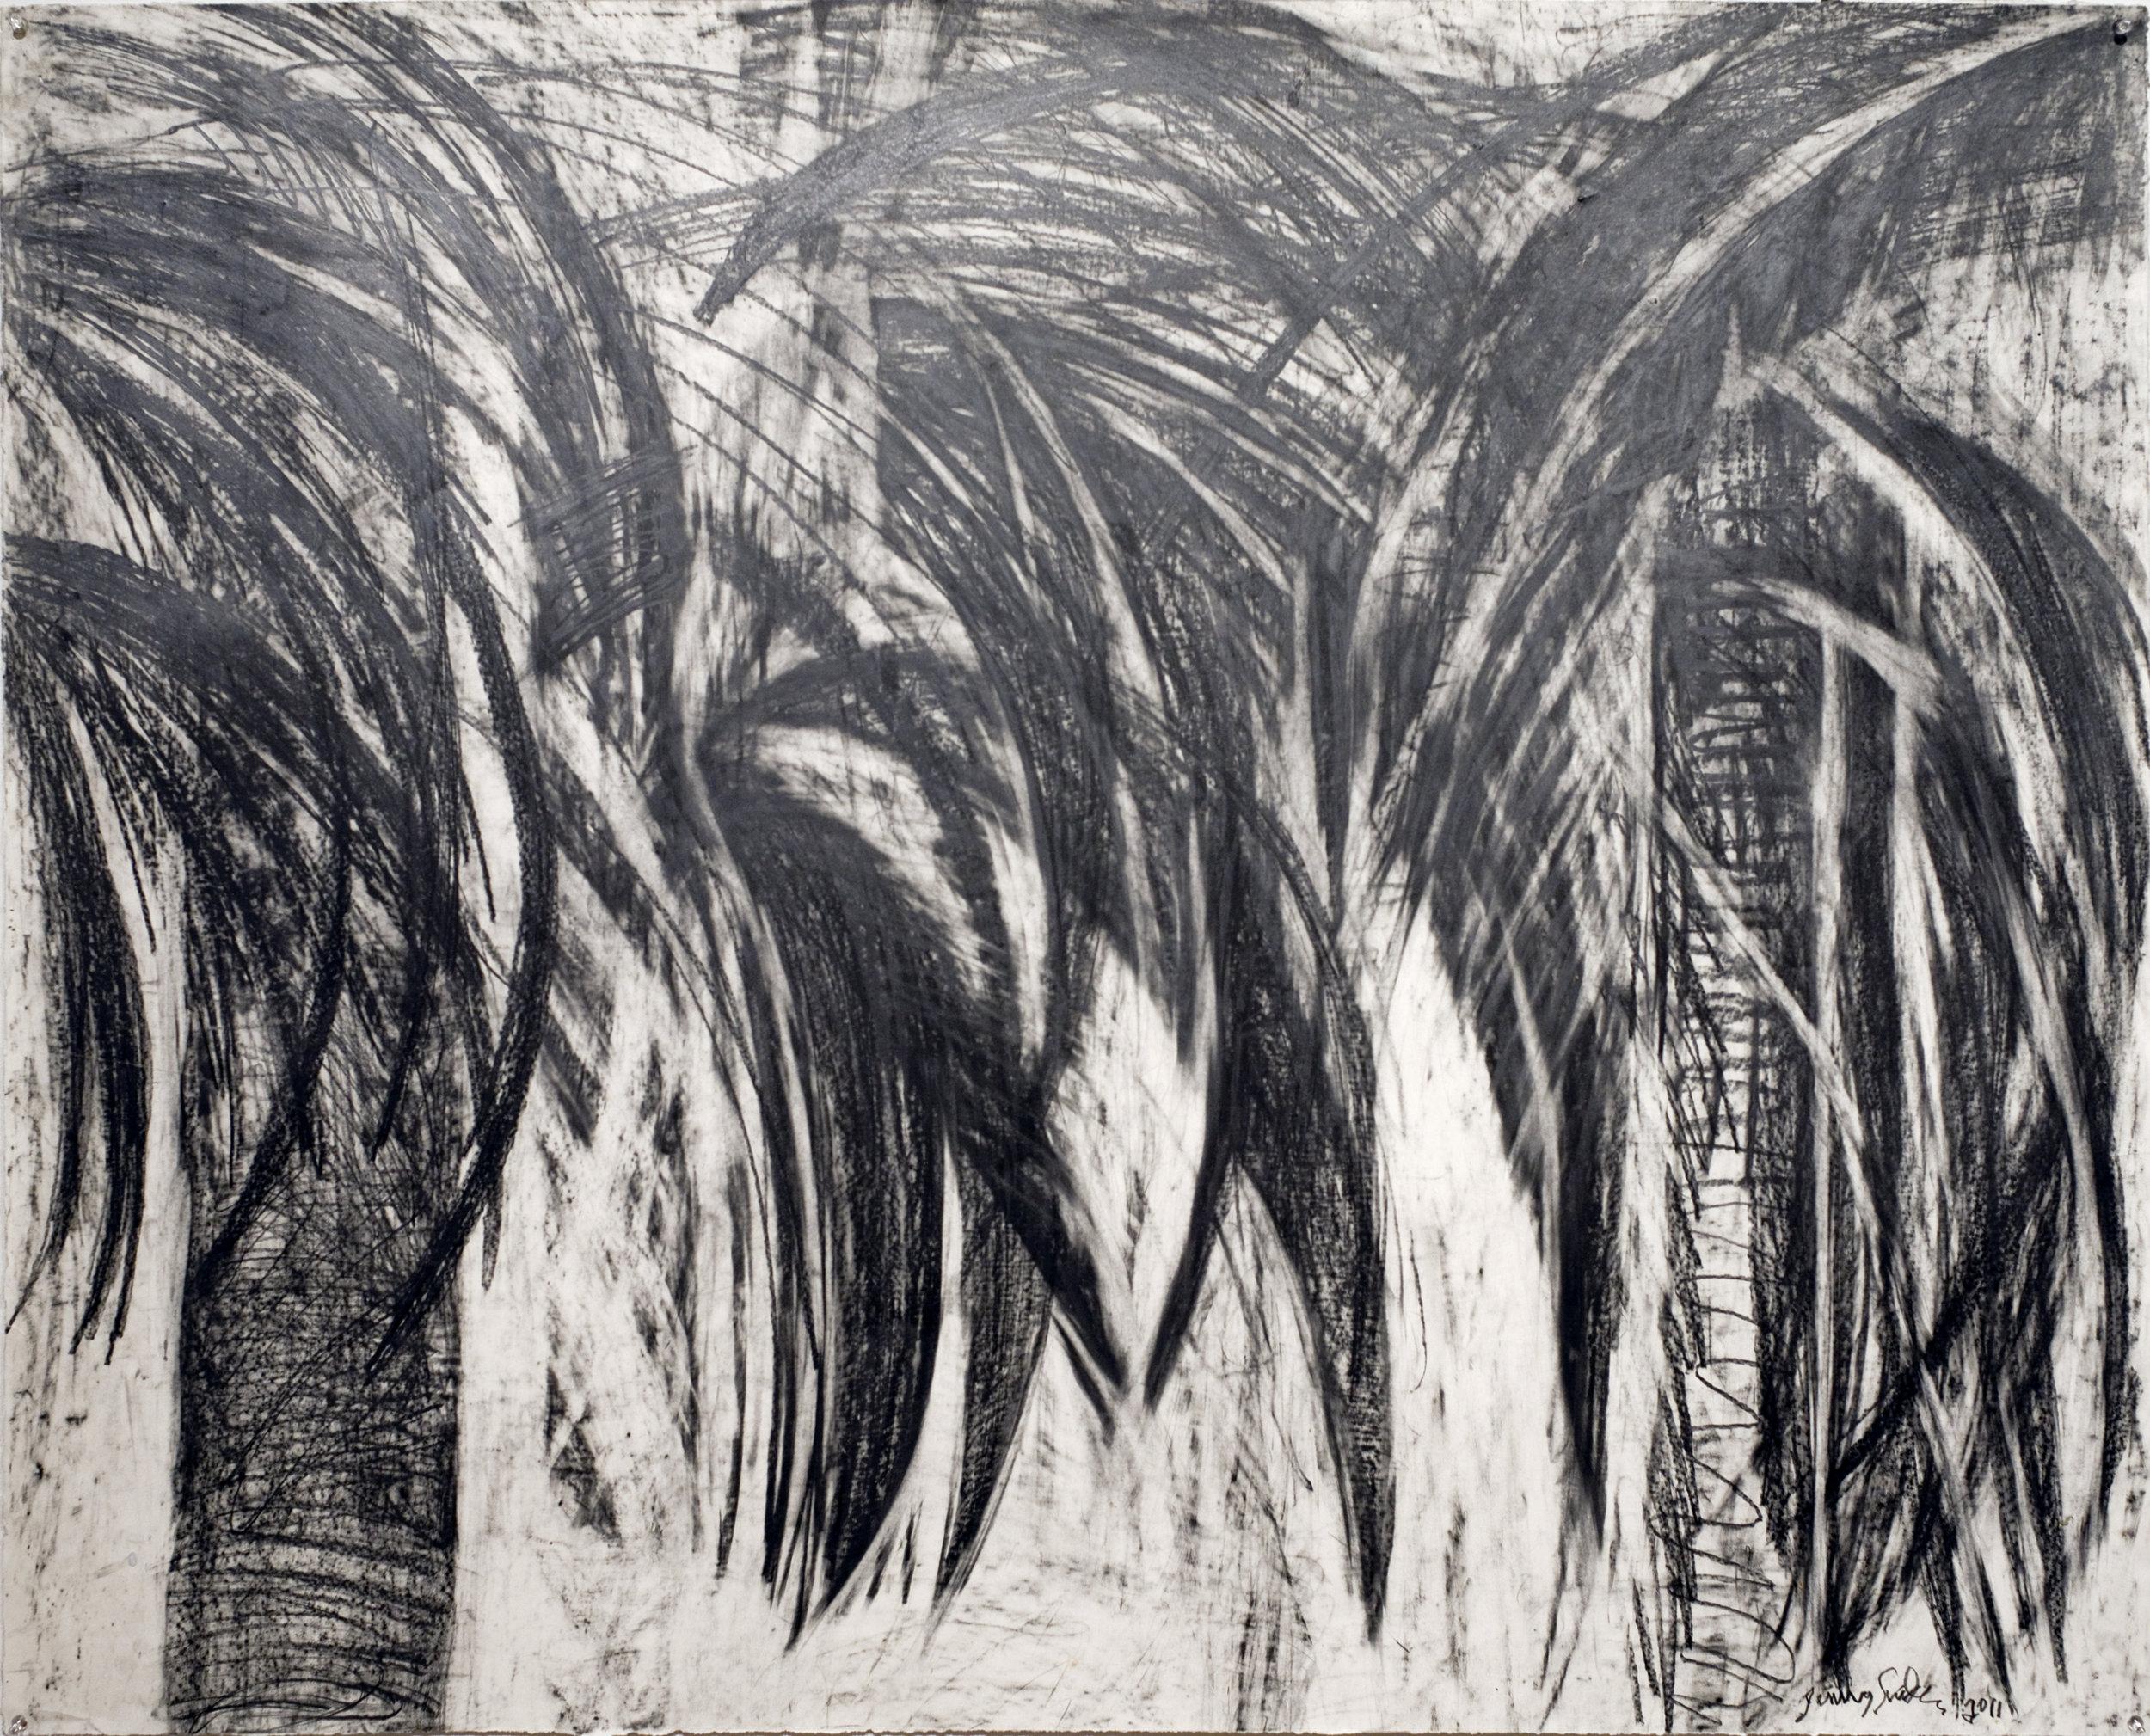 Jenny Snider,  Dark Palms,  graphite on paper, 36h x 44.5w in.